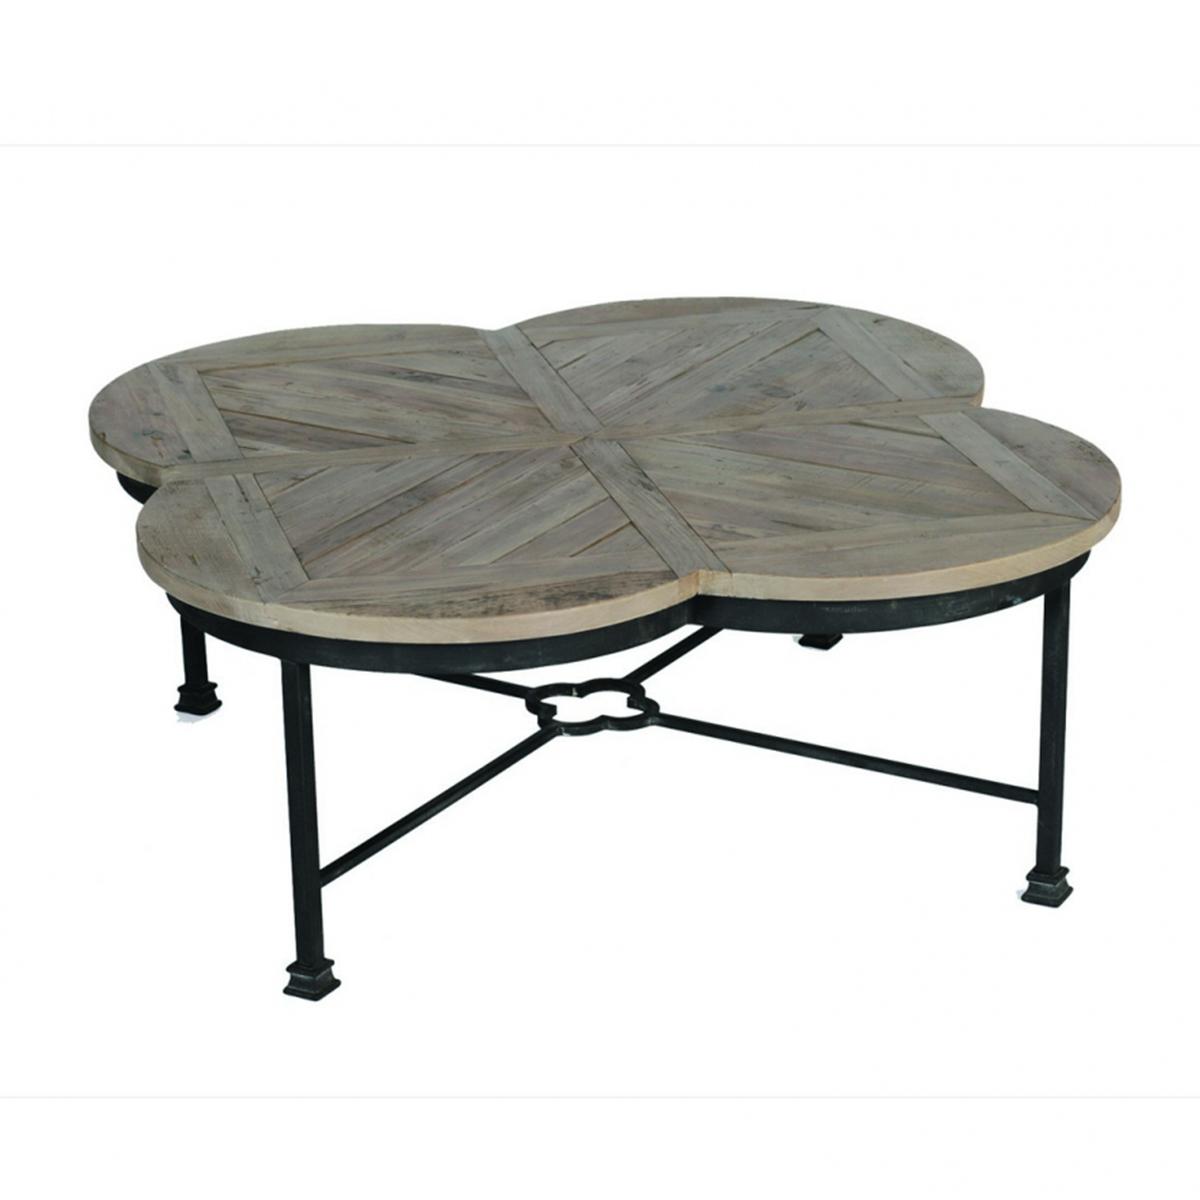 Edwin Quatrefoil Coffee Table